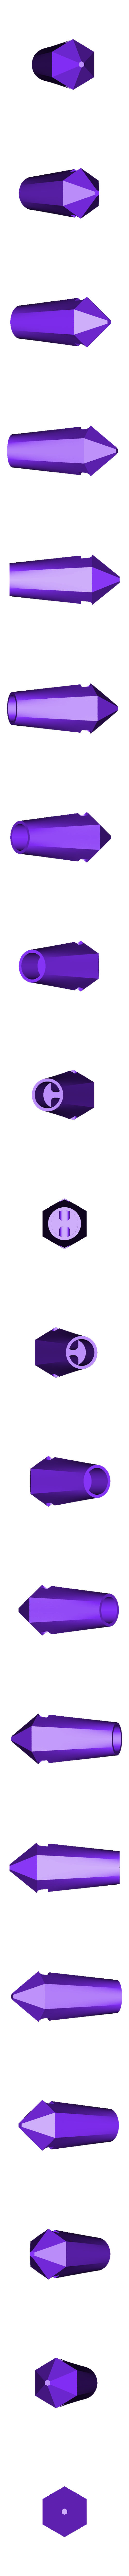 Lazy_Light_Switch_Handle.stl Download free STL file Lazy Light System • Design to 3D print, 3DBROOKLYN